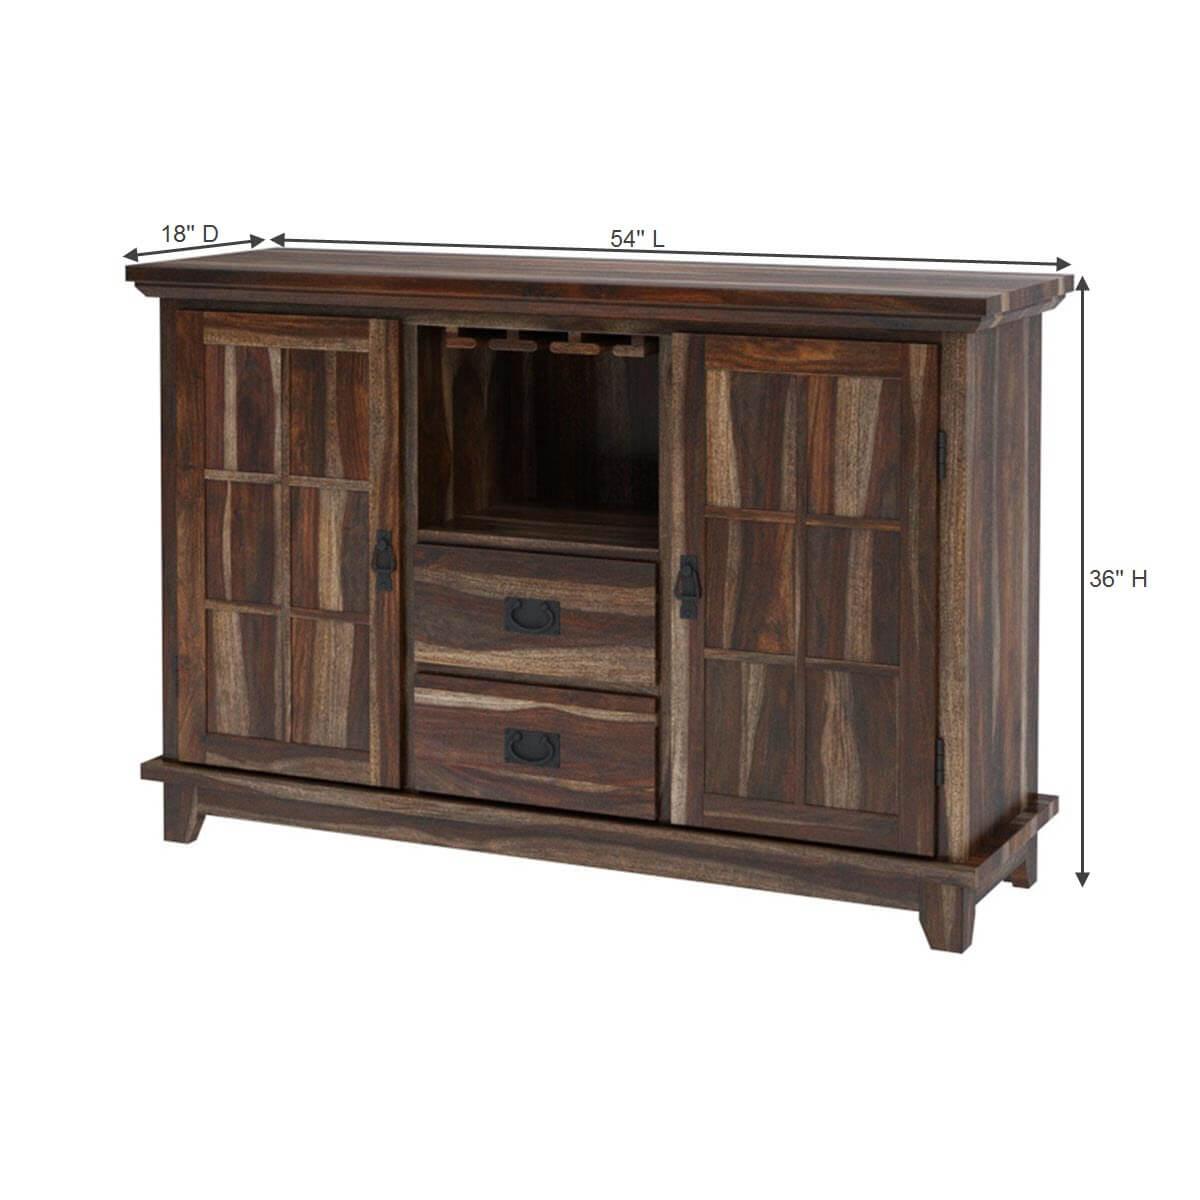 Alabama modern stylish solid wood 2 drawer sideboard cabinet for Sideboard modern